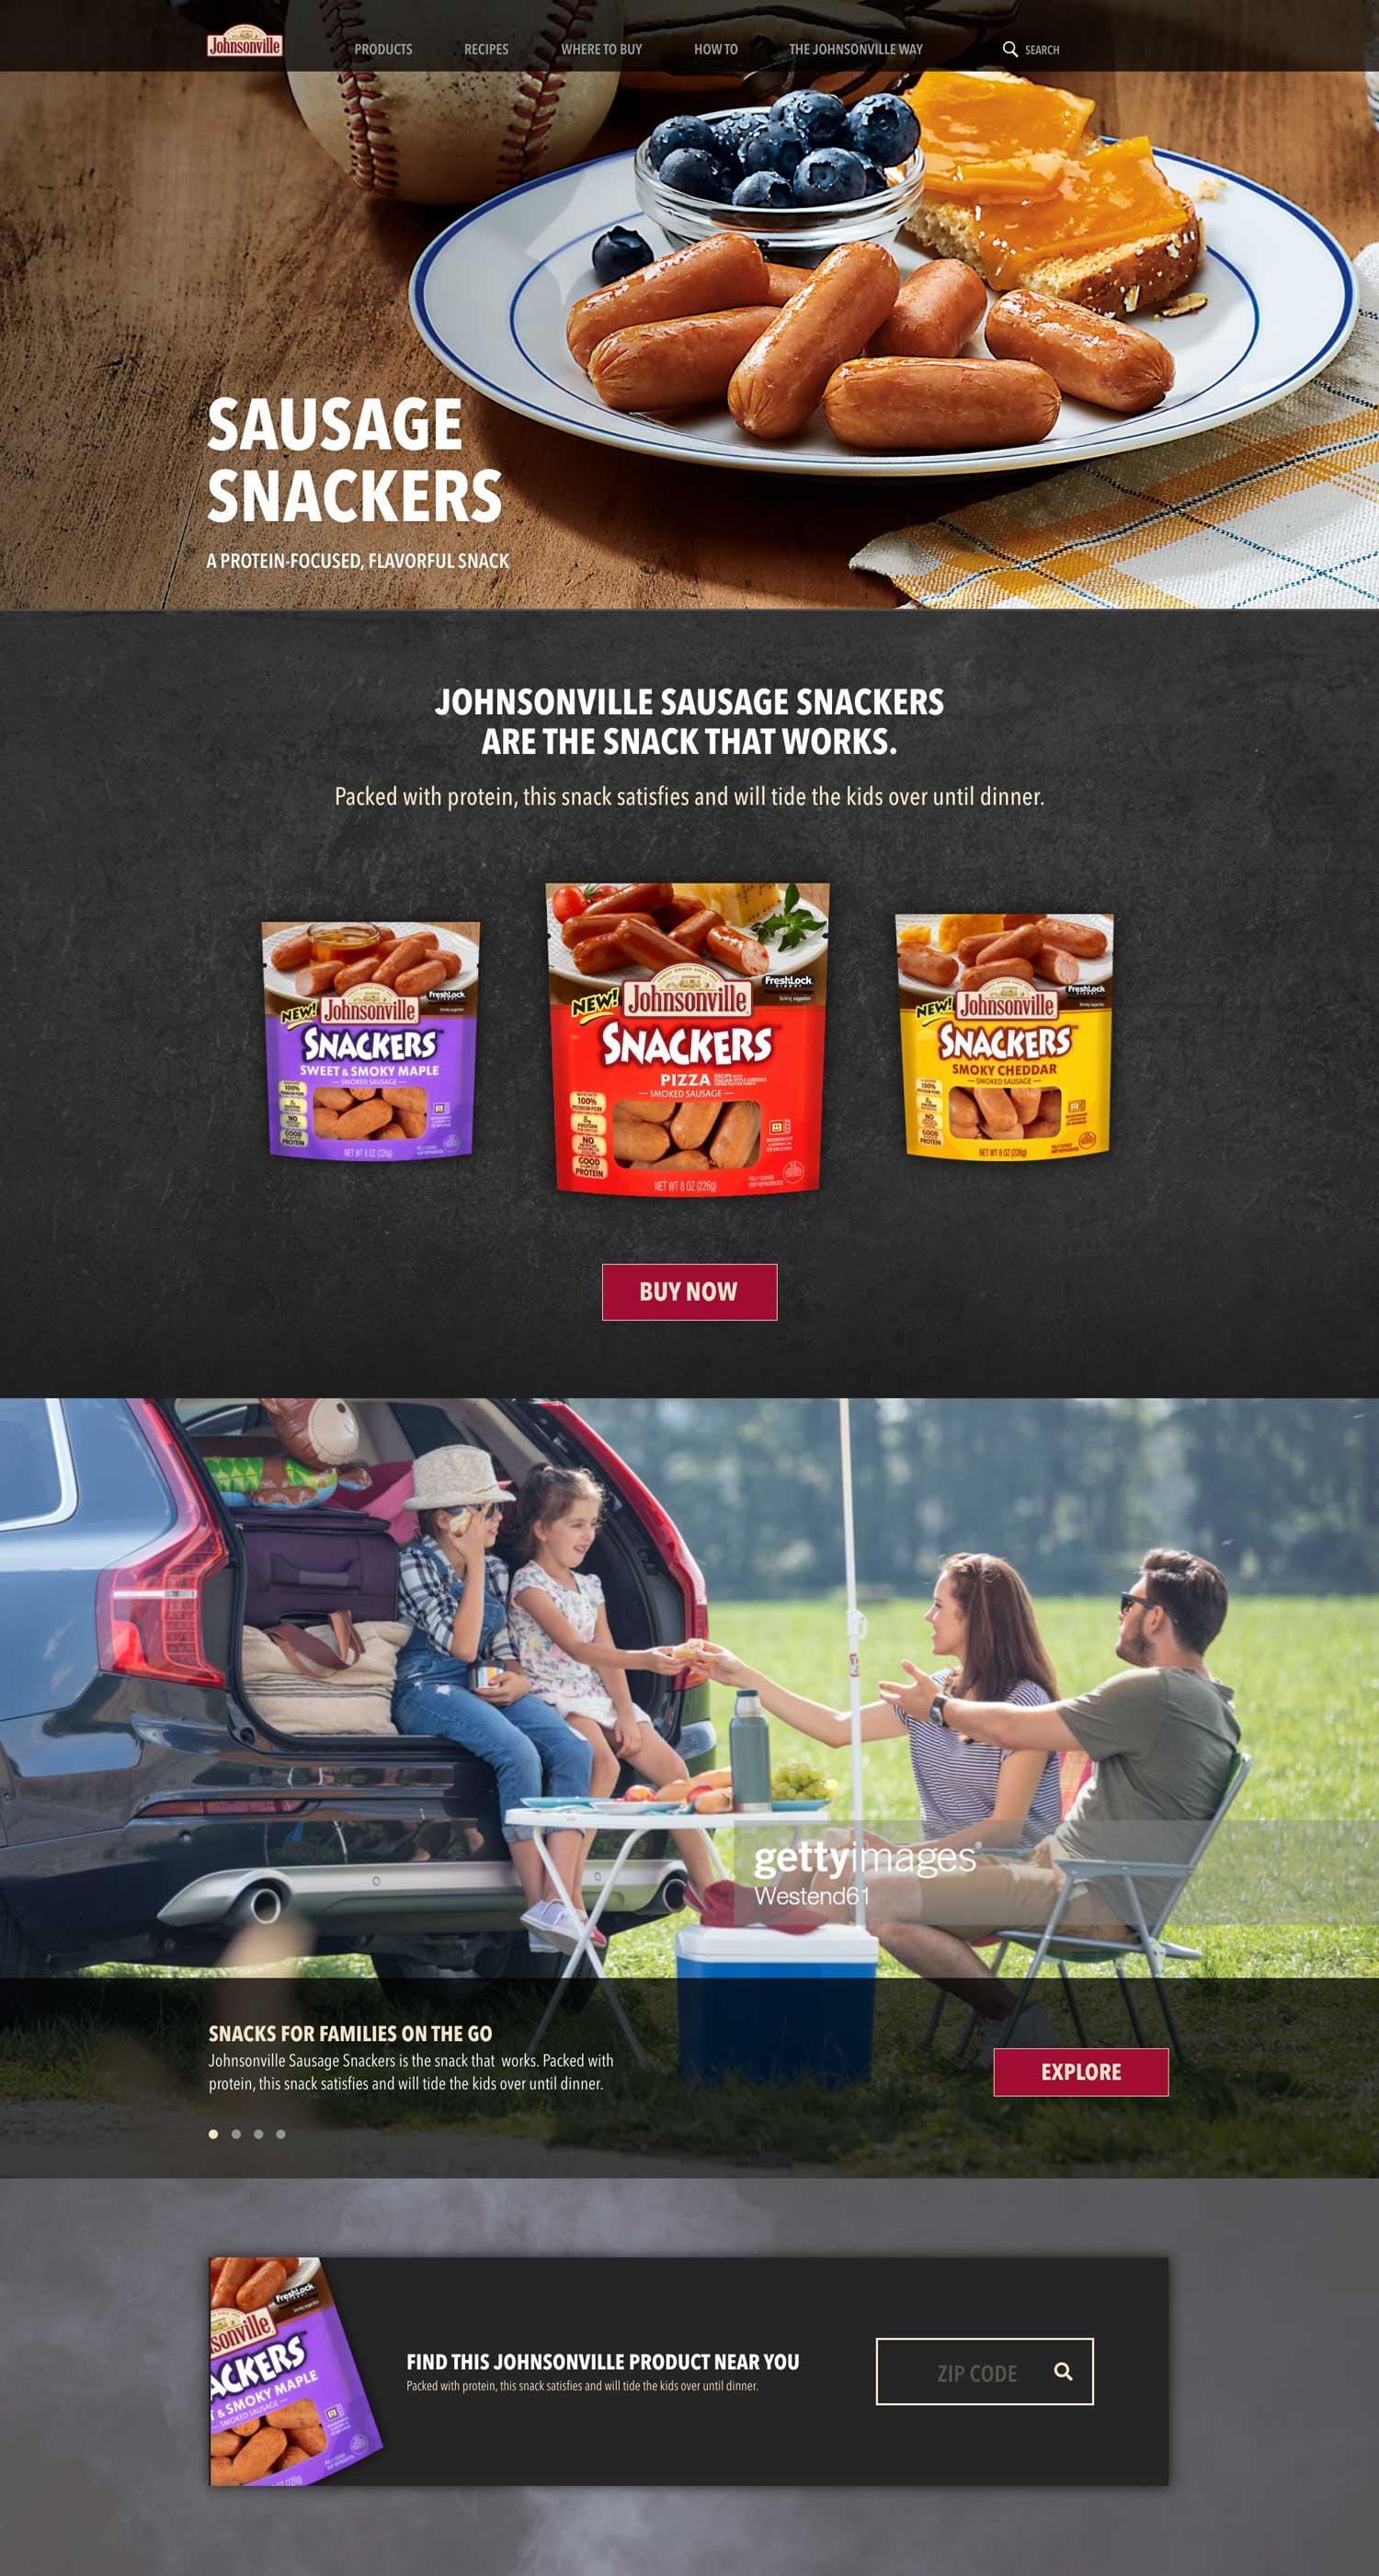 sausage snackers design